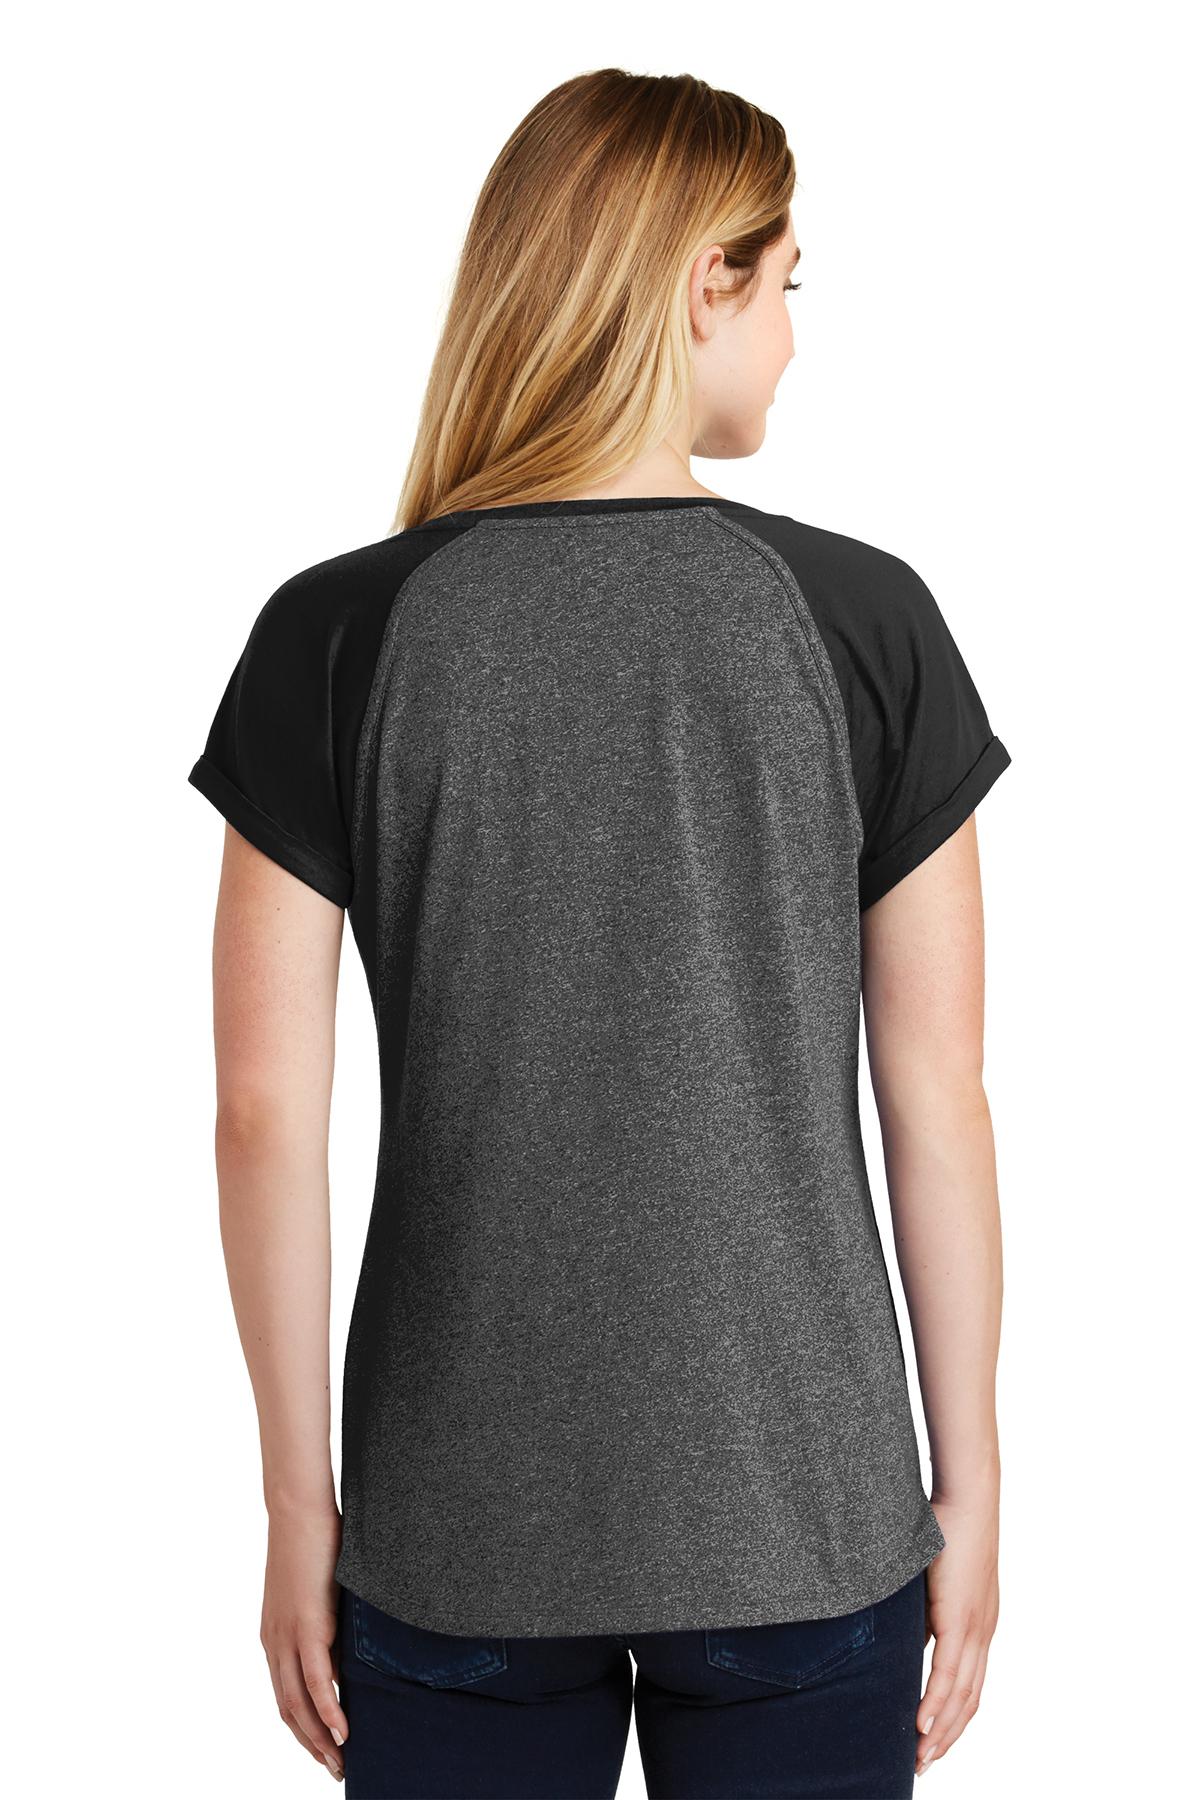 New Era 174 Ladies Heritage Blend Varsity Tee T Shirts